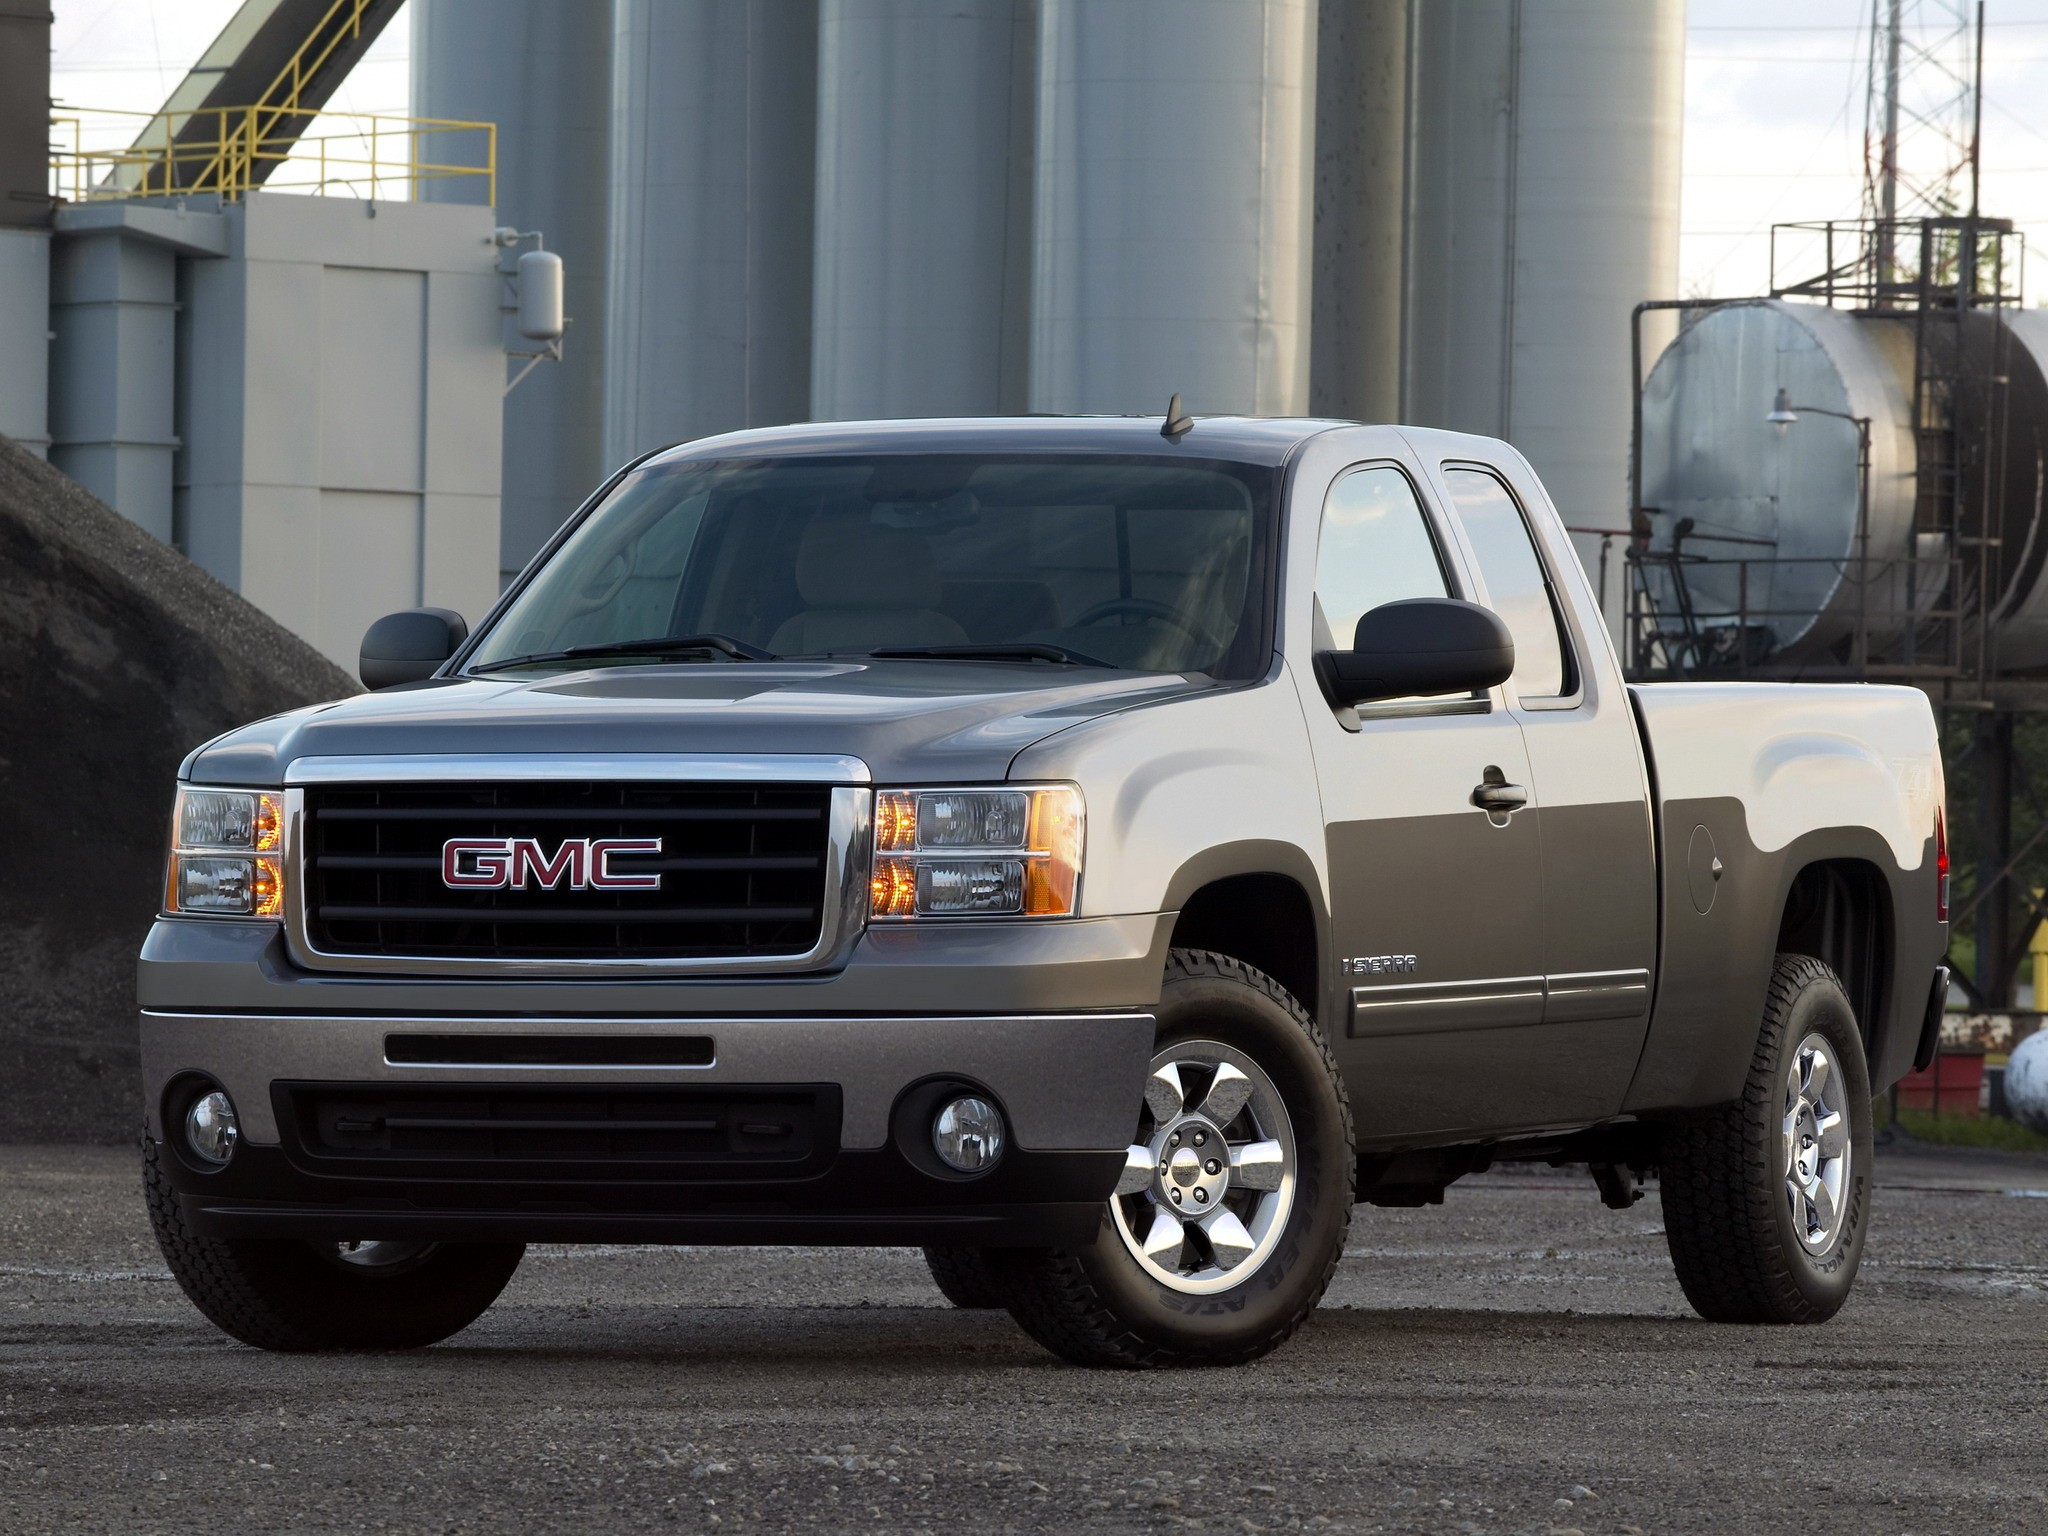 Gmc Sierra 1500 Extended Cab Specs 2008 2009 2010